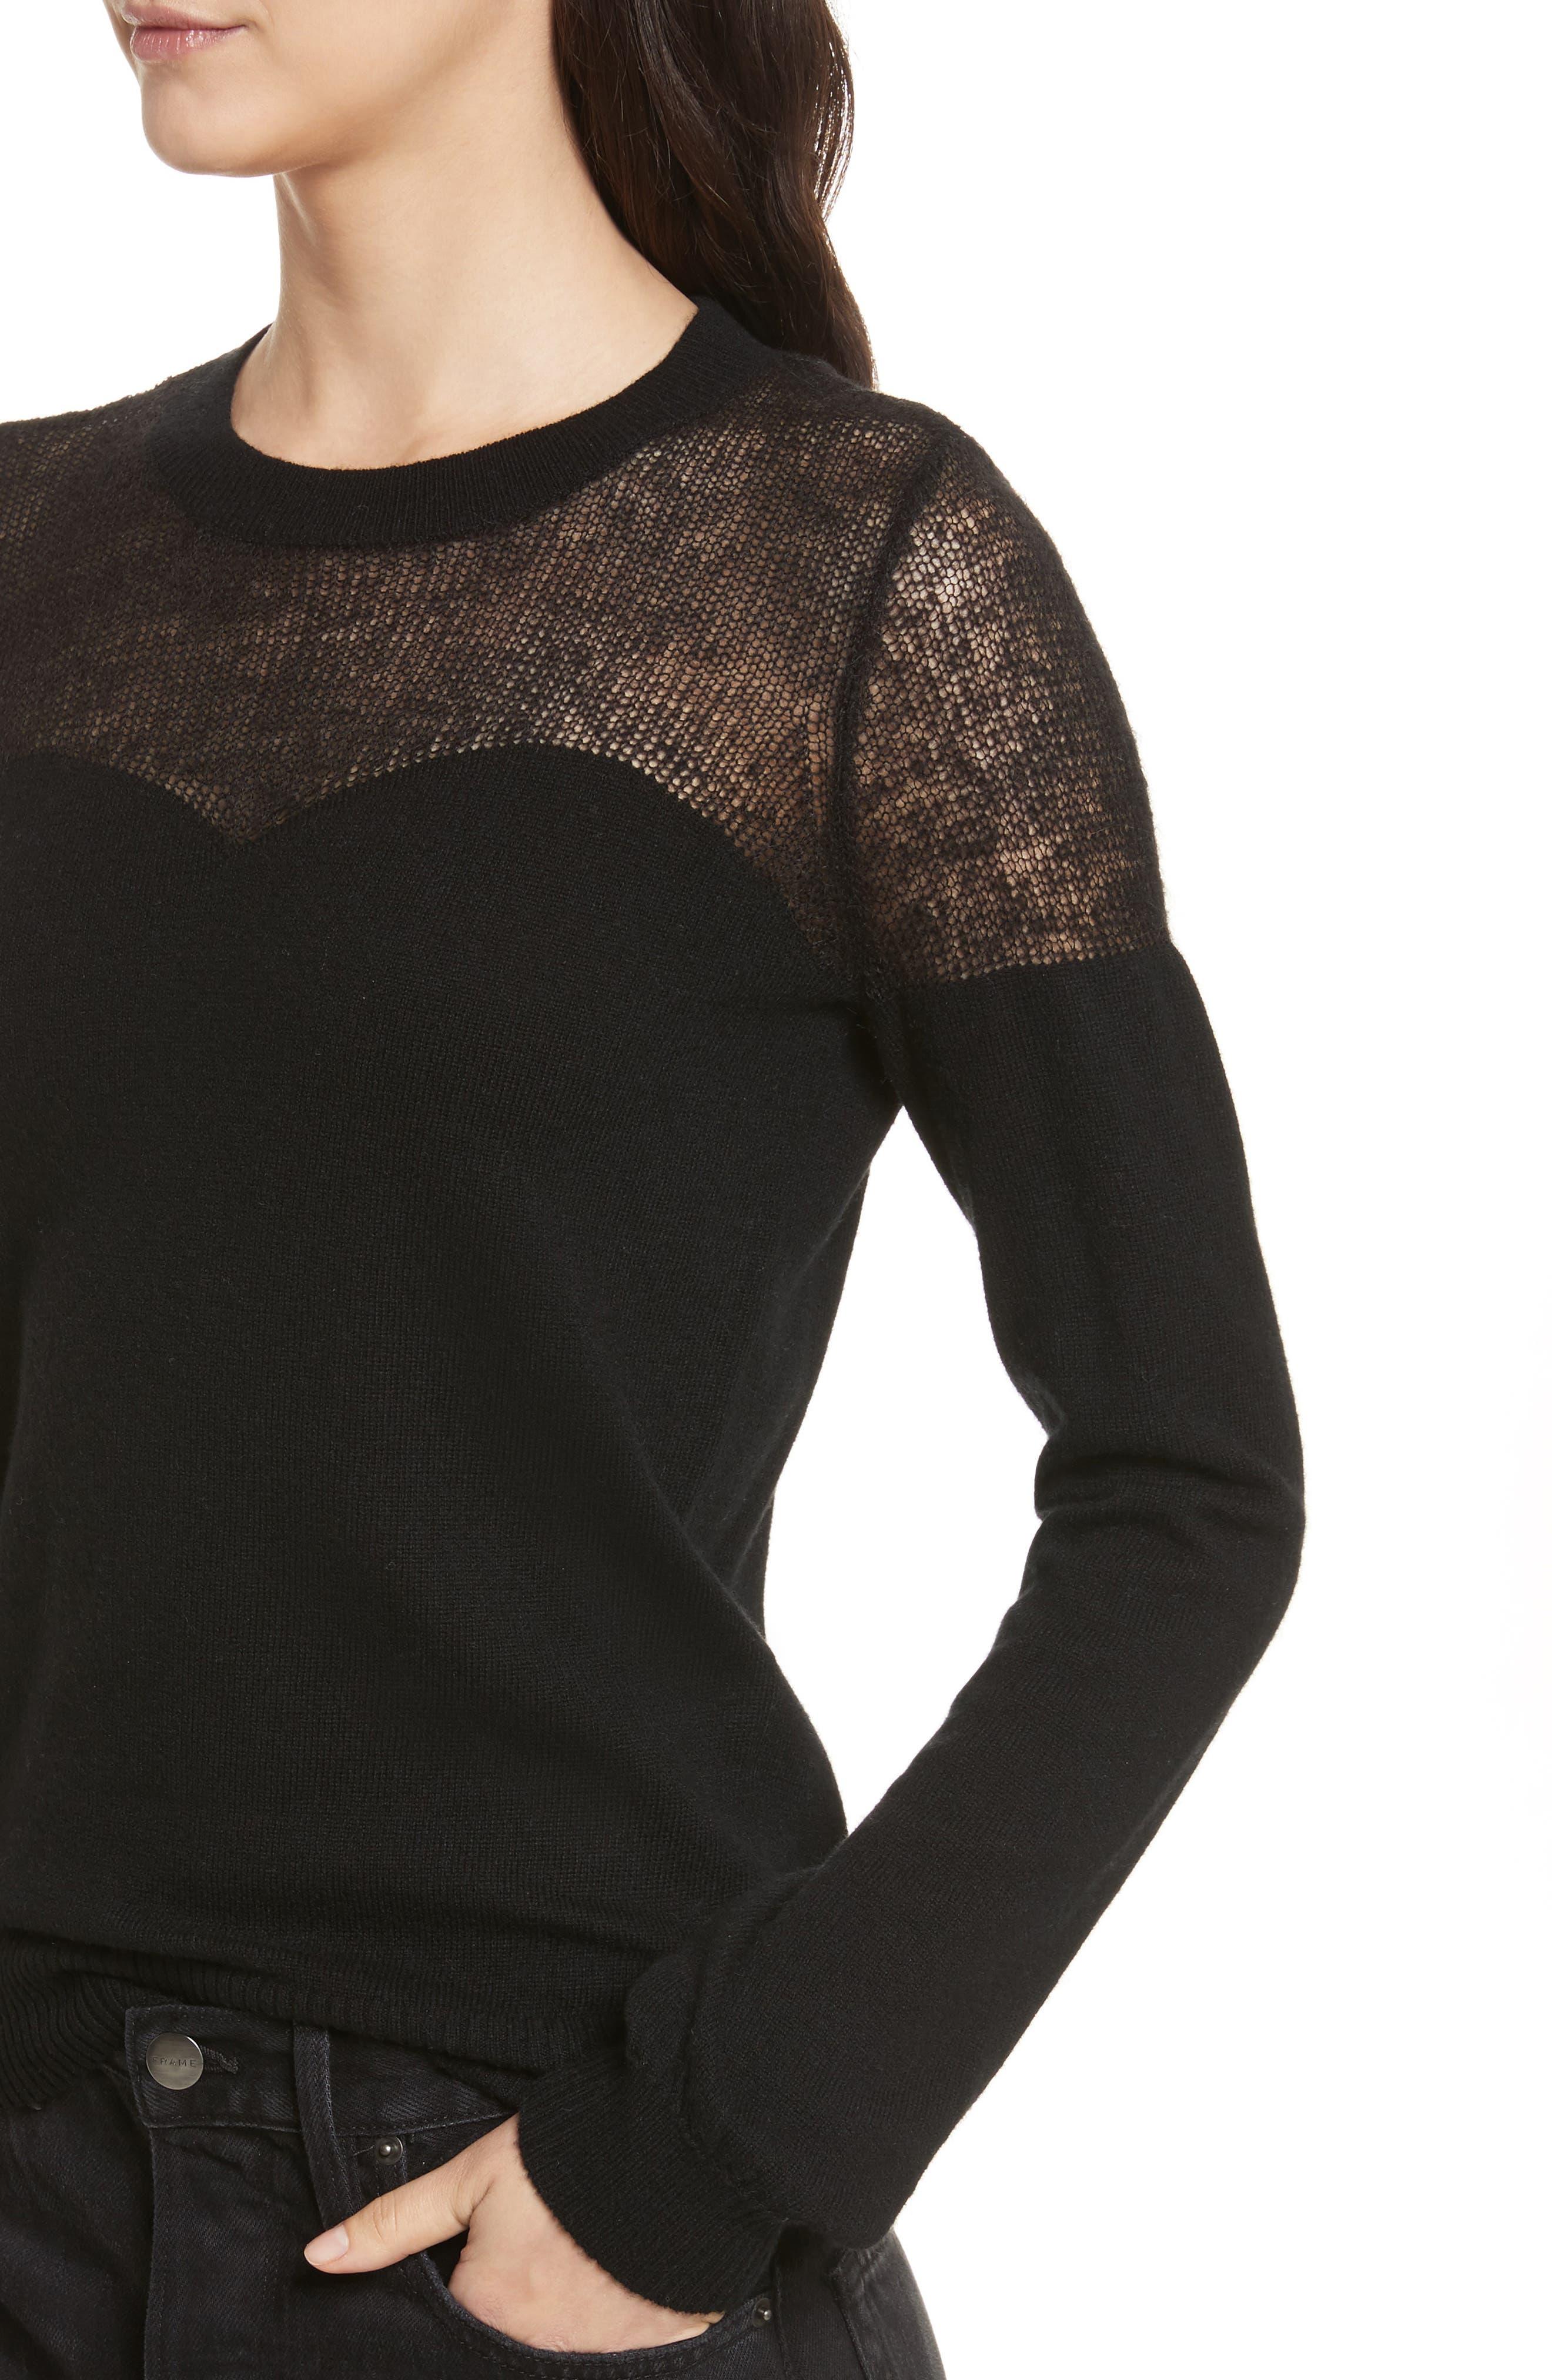 Clarence Sweater,                             Alternate thumbnail 4, color,                             Black Multi